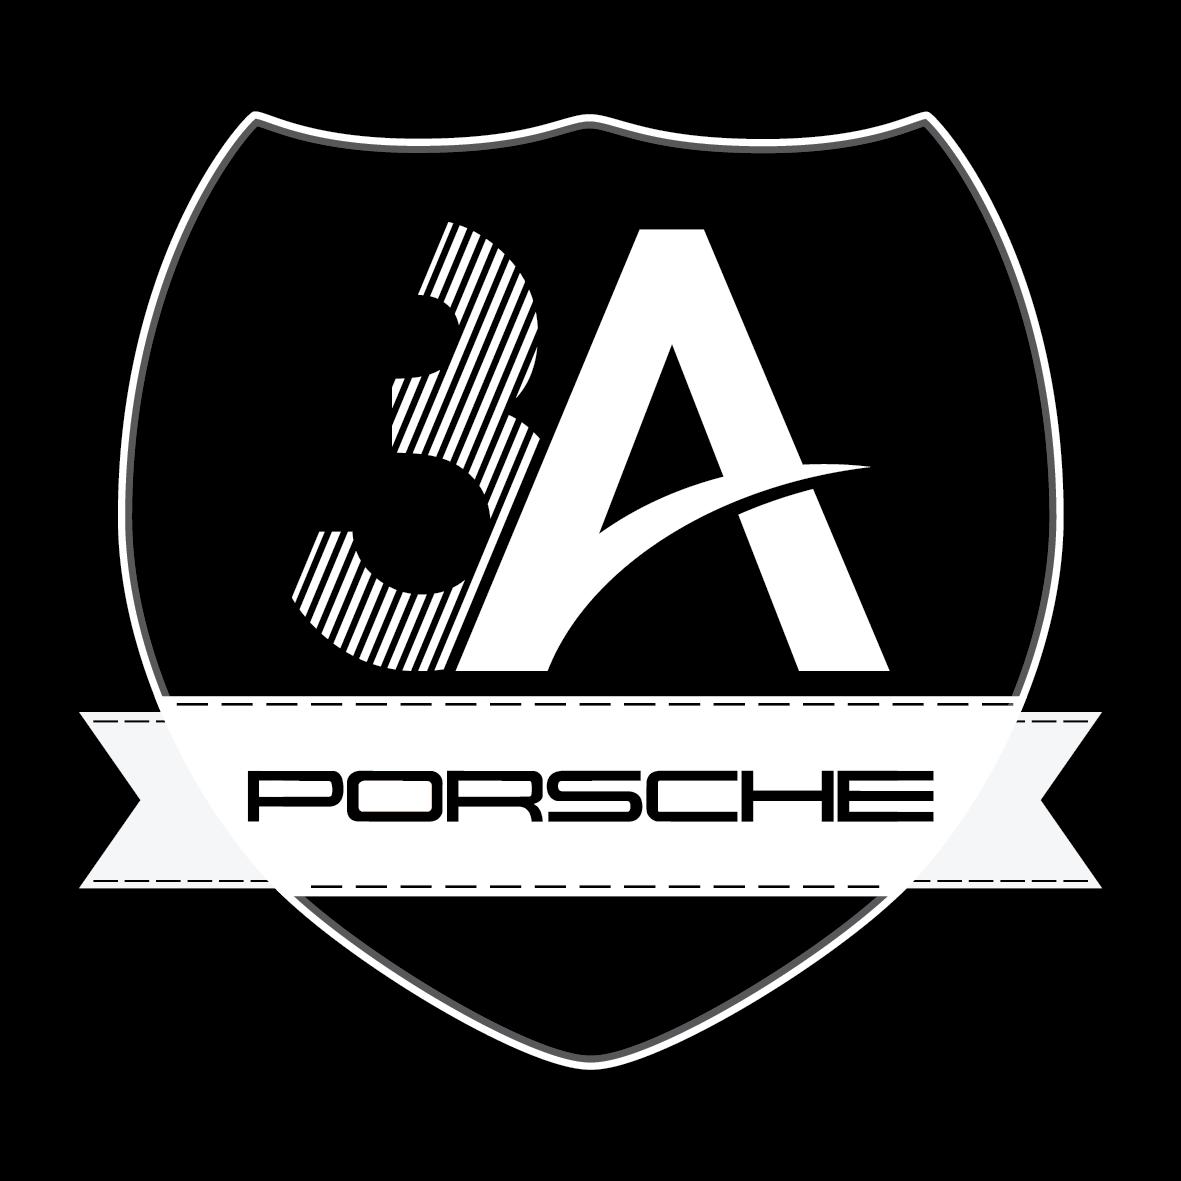 3a porsche logo tasarimi siyah zemin çizgisel